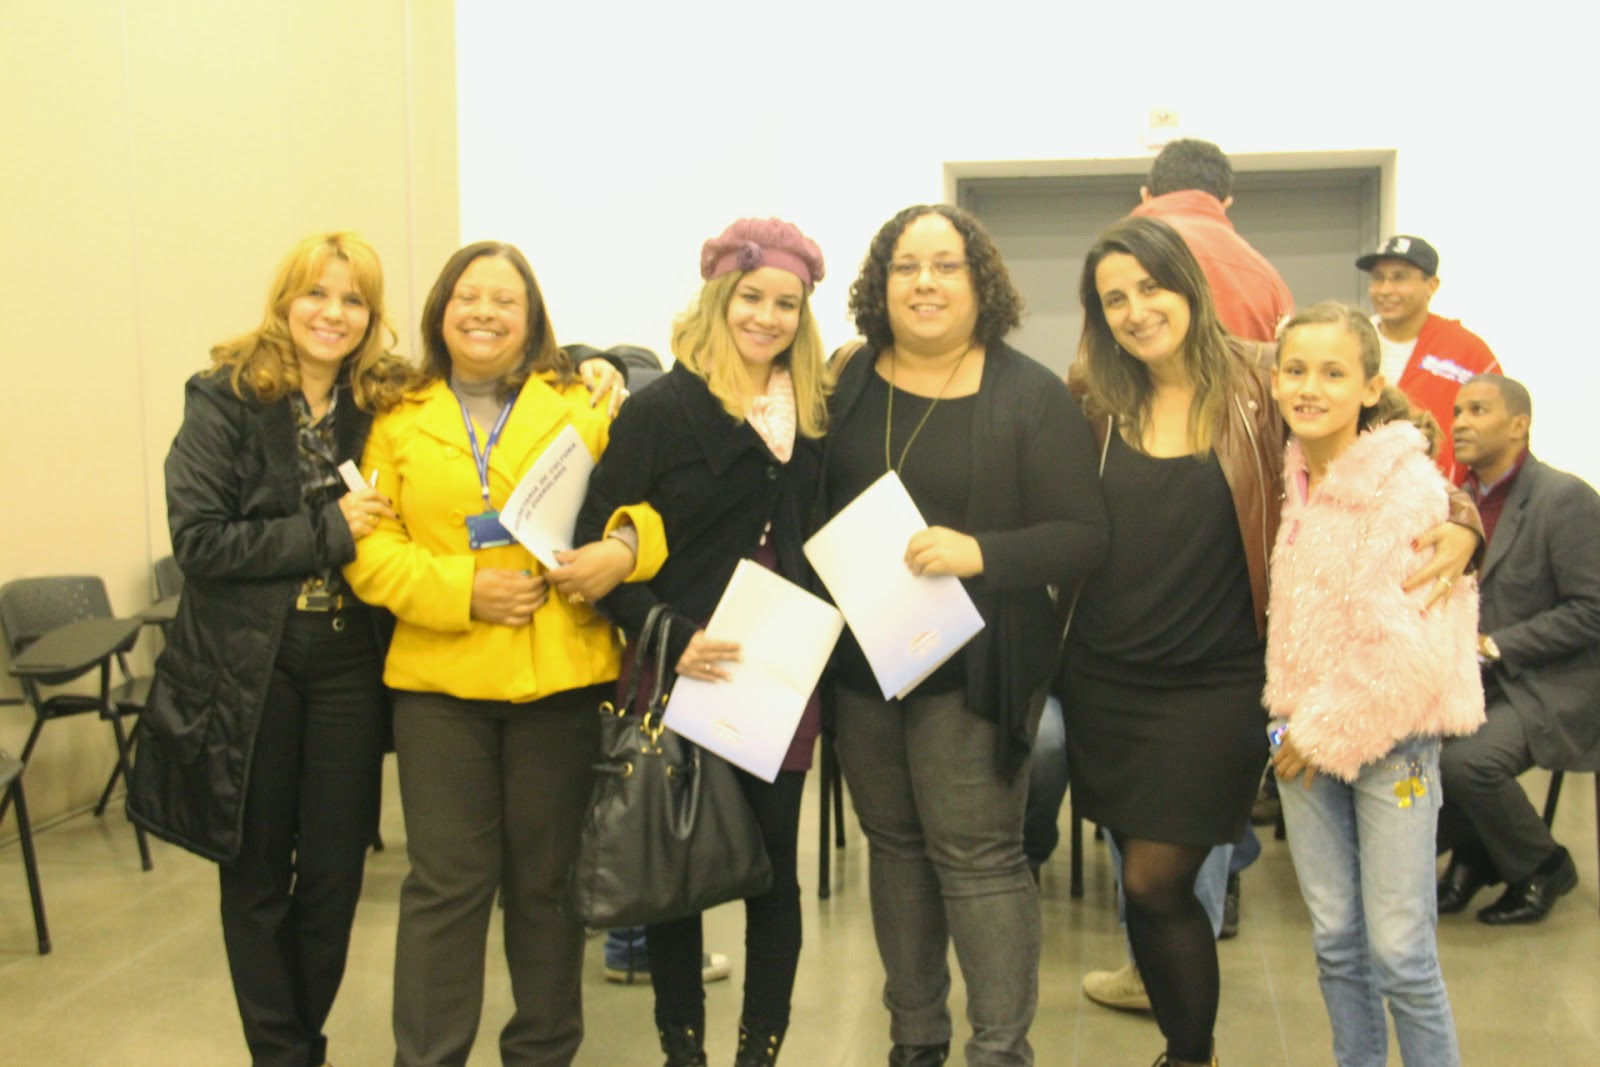 http://janethefontes.blogspot.com.br/p/fotos-videos.html